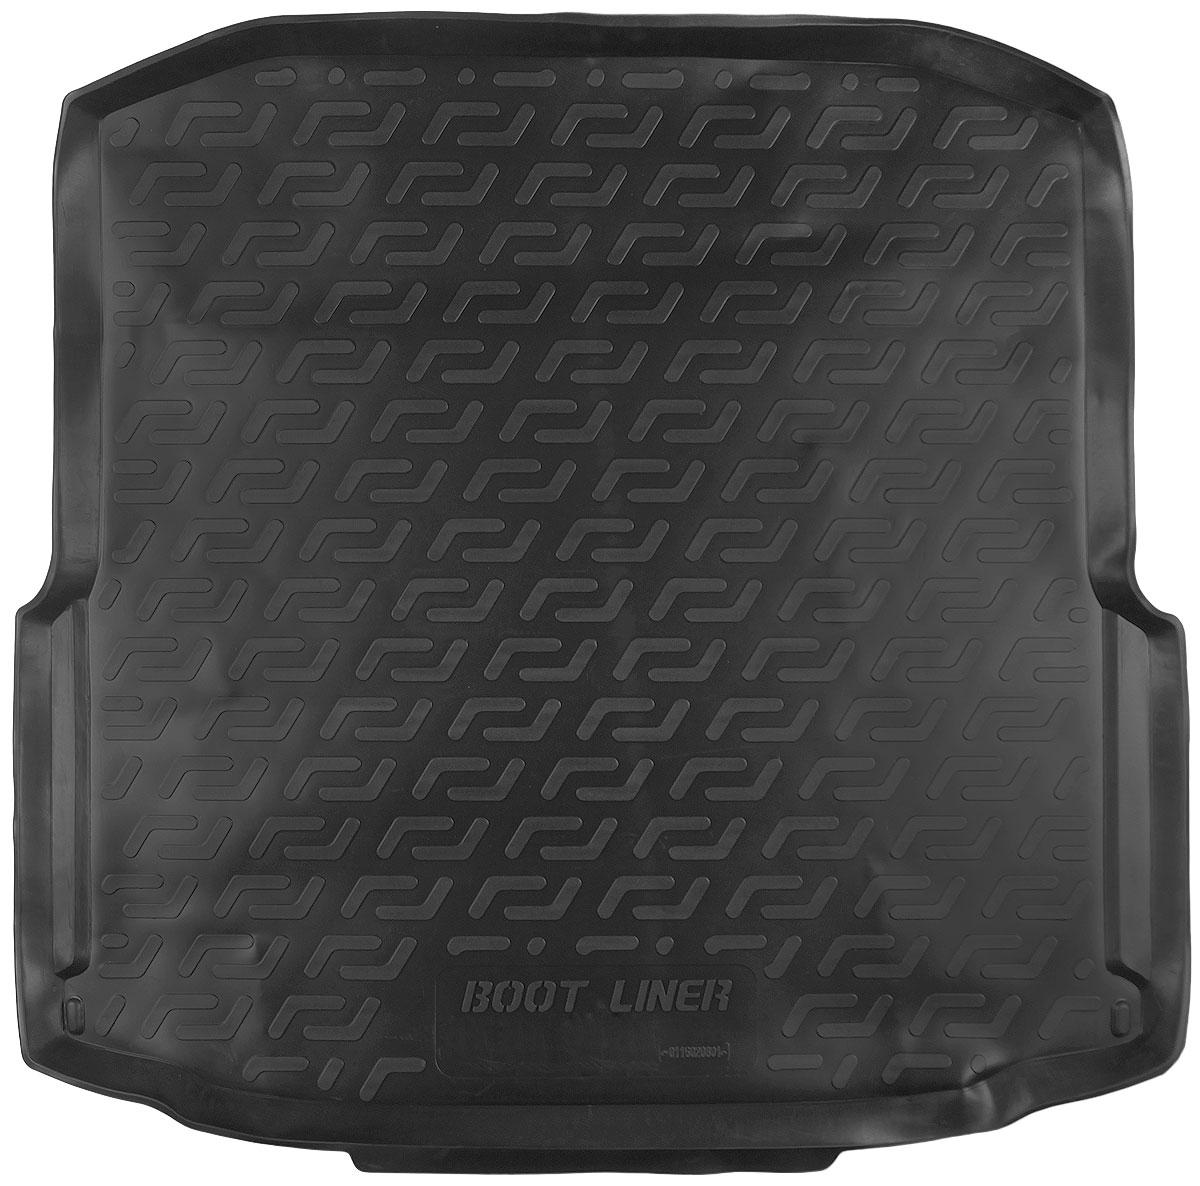 Коврик в багажник L.Locker, для Skoda Octavia III liftback (13-) автомобильный коврик seintex 677 для skoda octavia